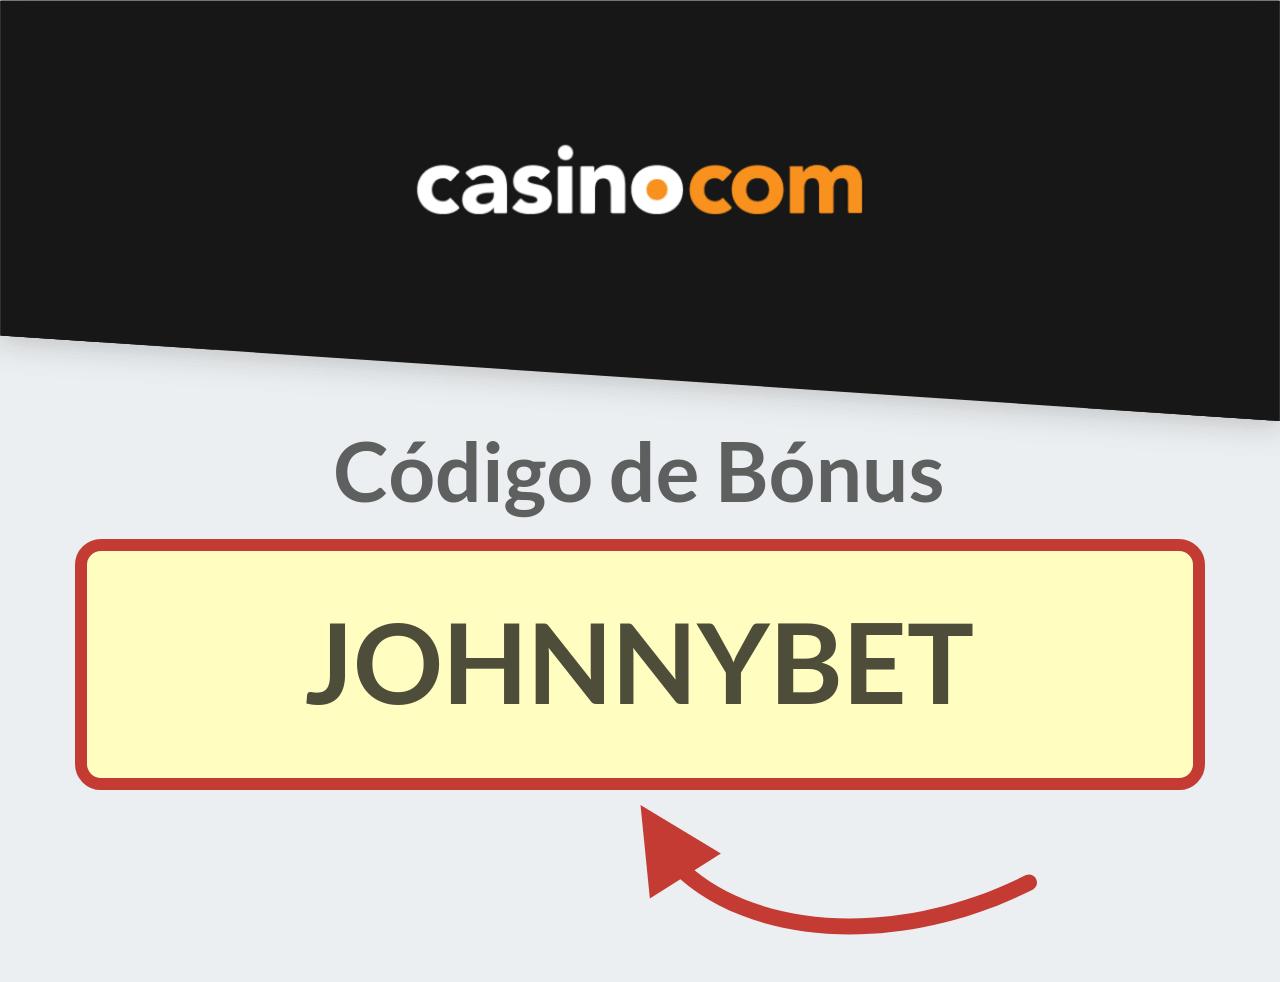 Casino.com Brasil